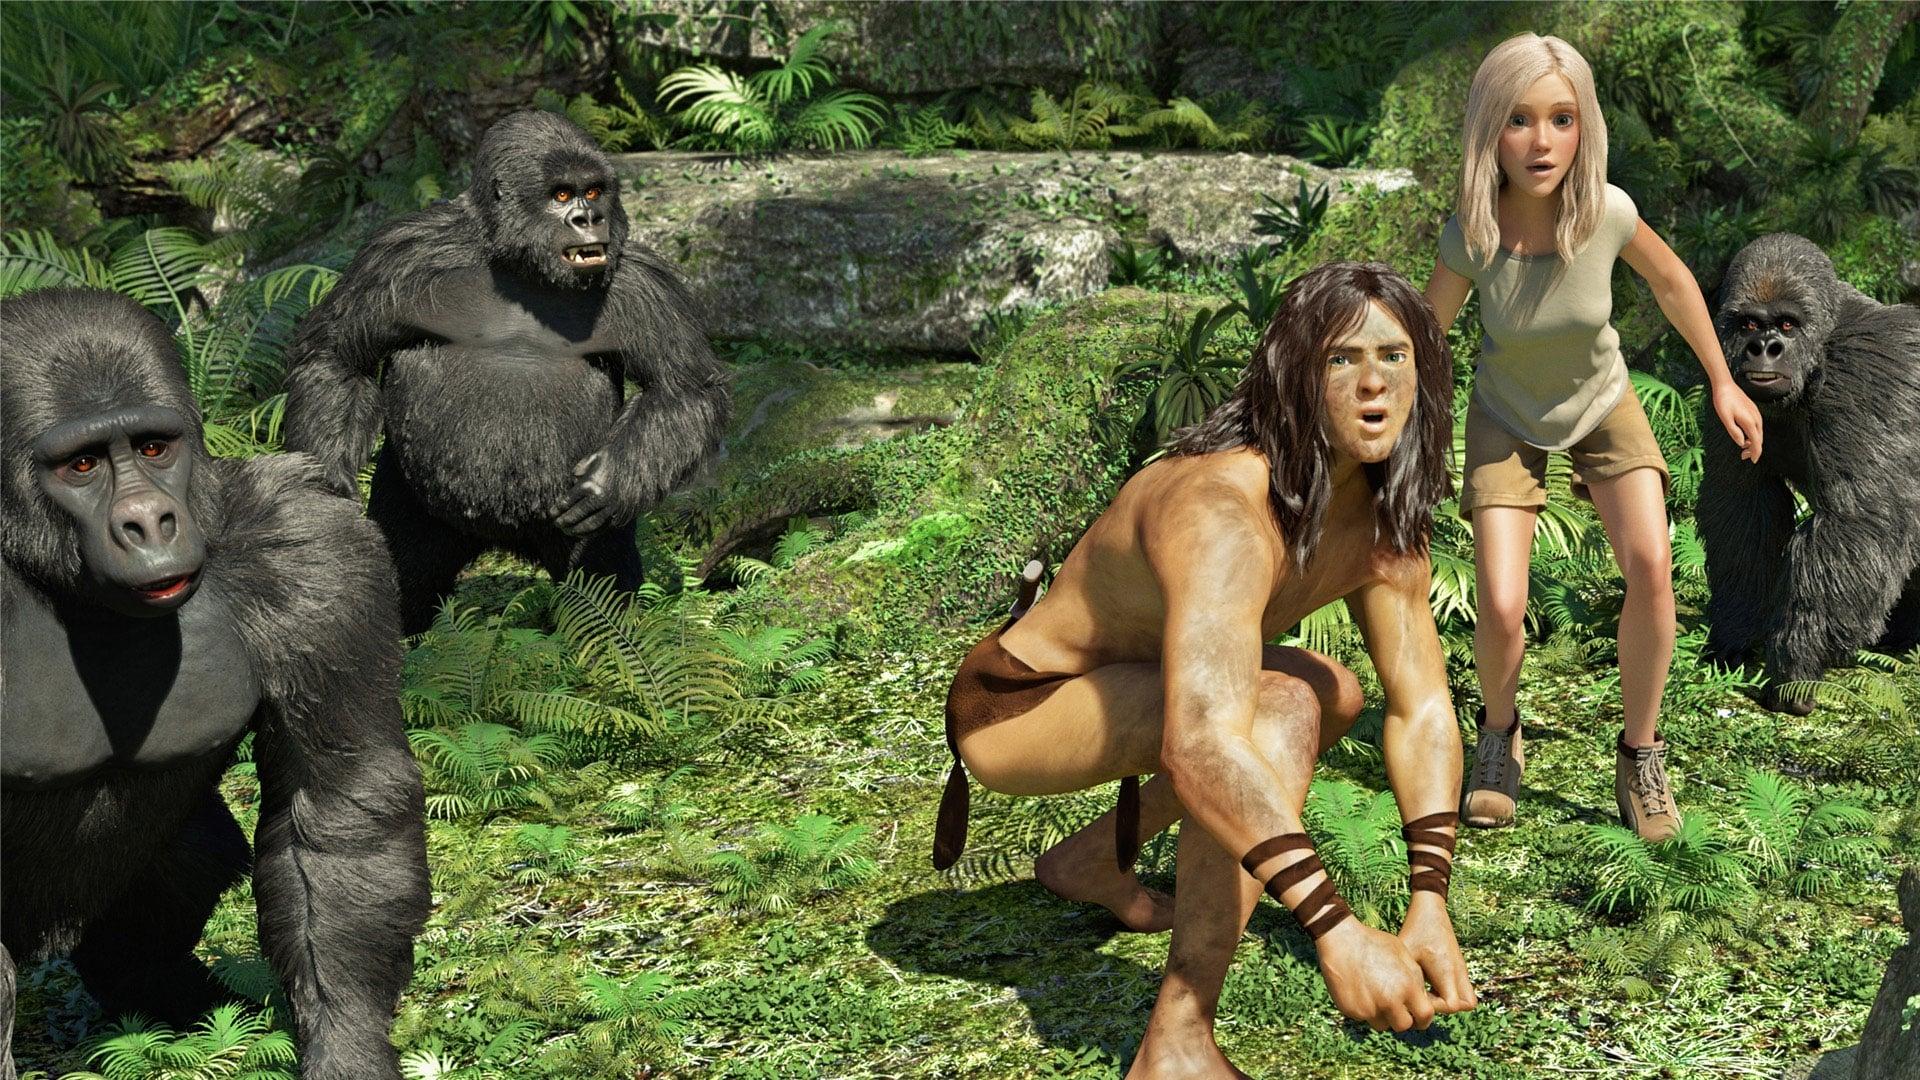 Tarzan Film Kinox.To